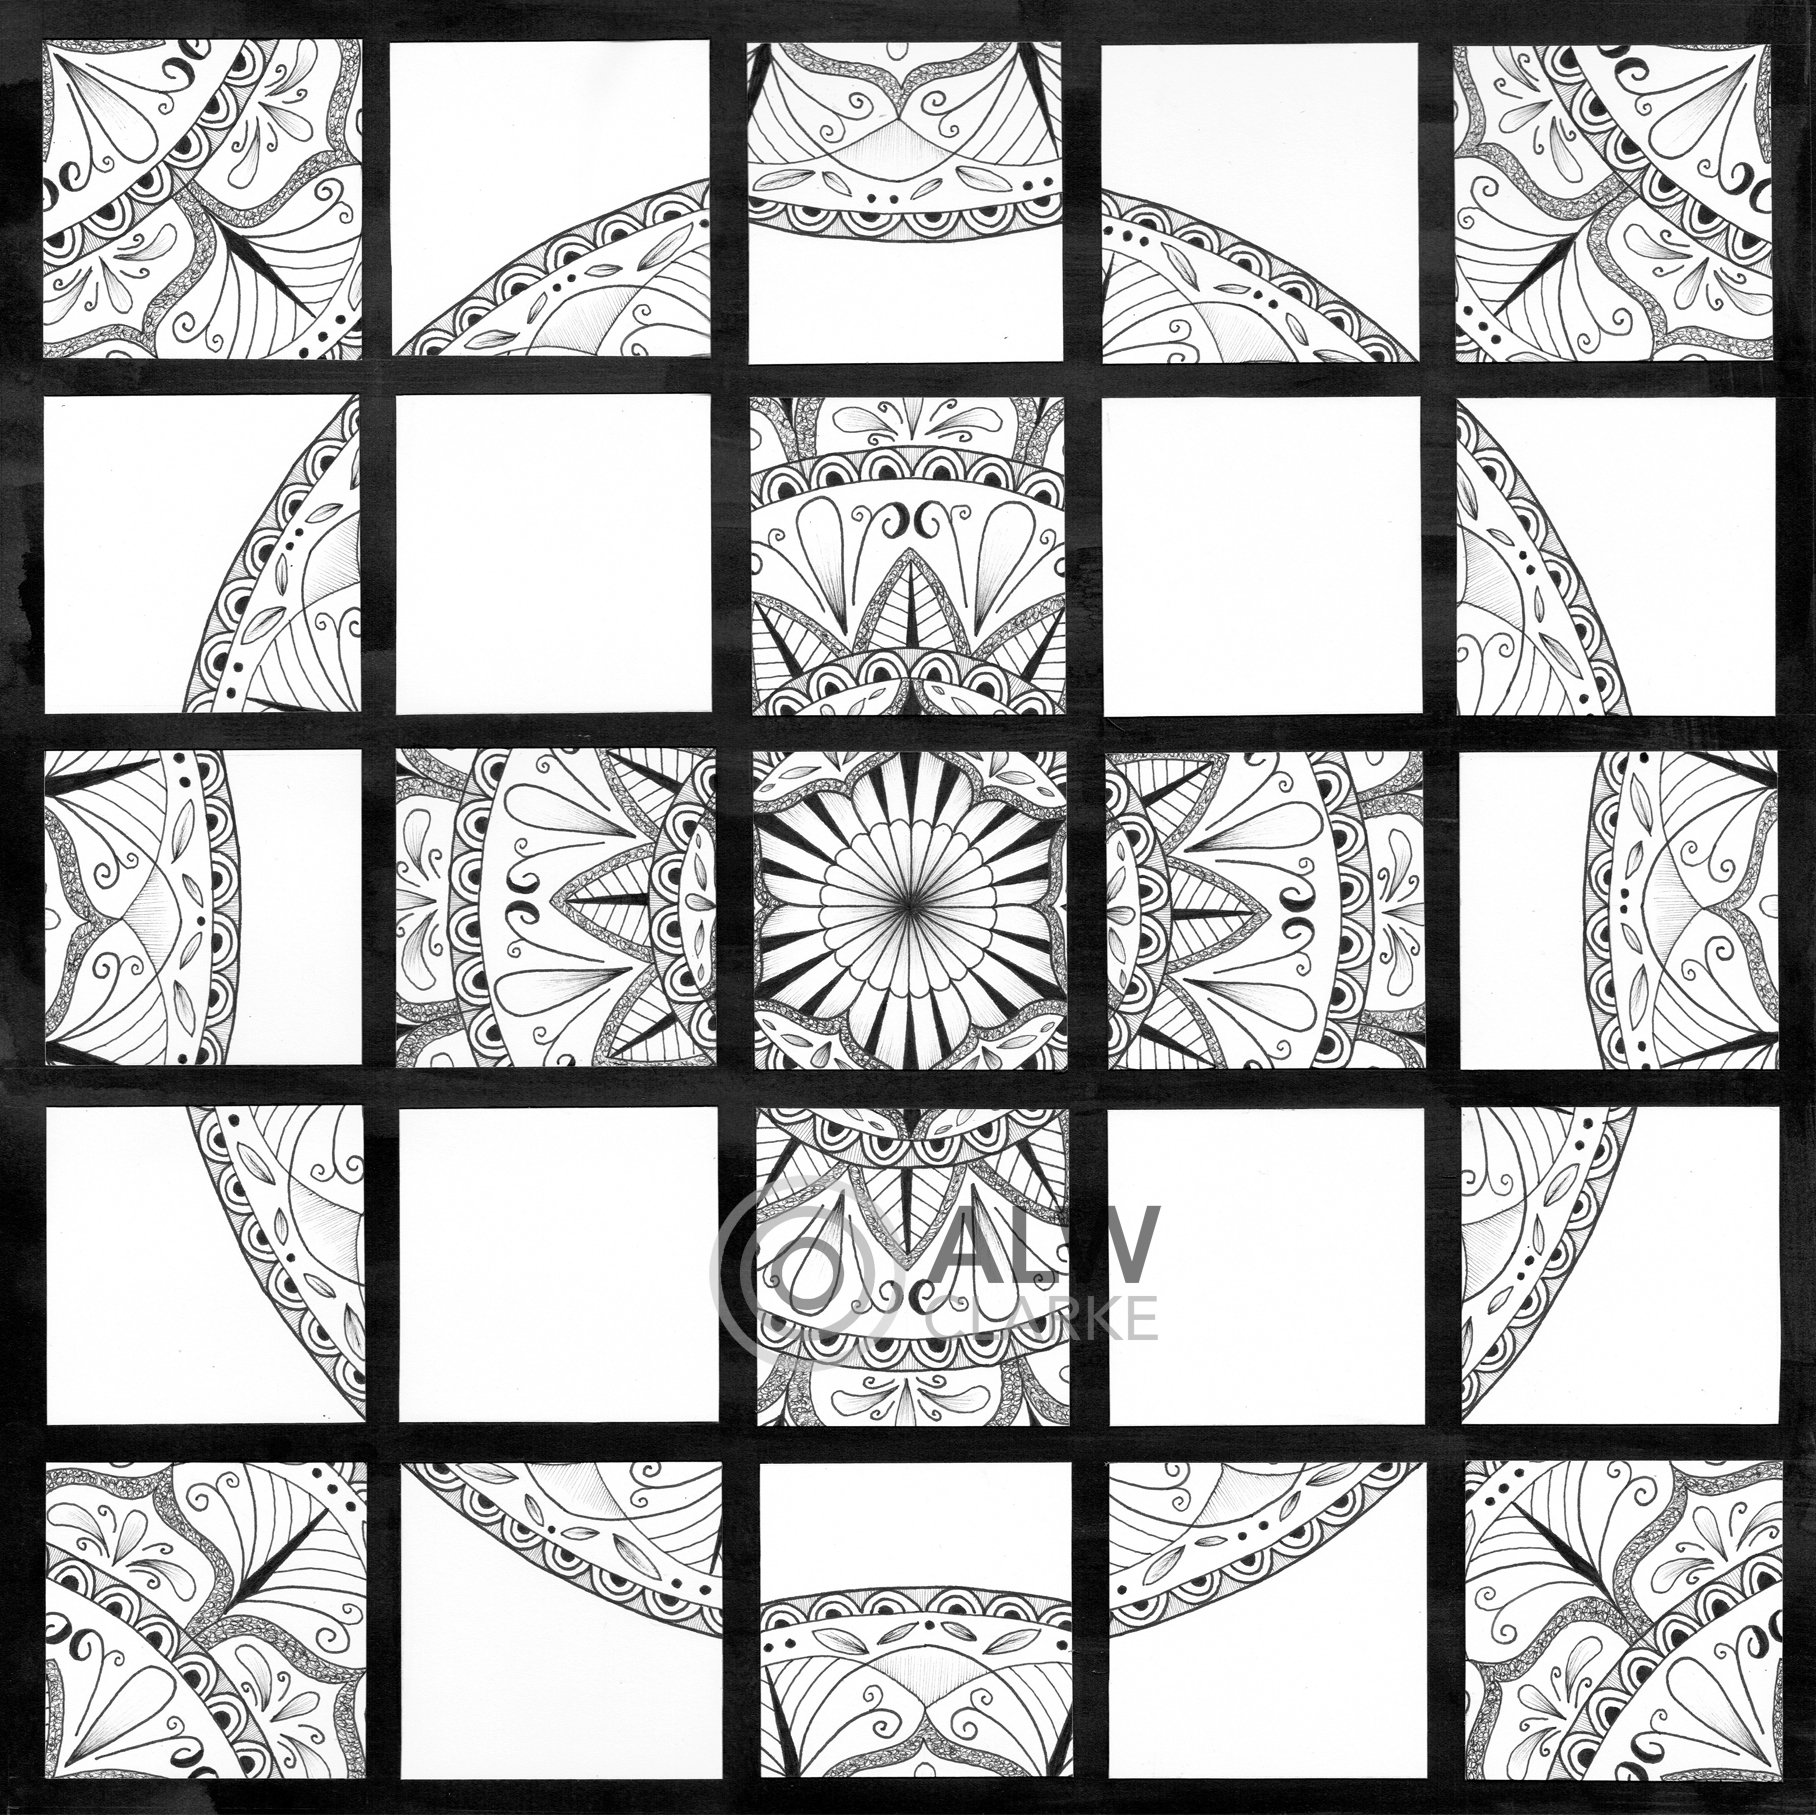 ALW-Clarke-Reframed-Open-Mind-Artwork.jpg